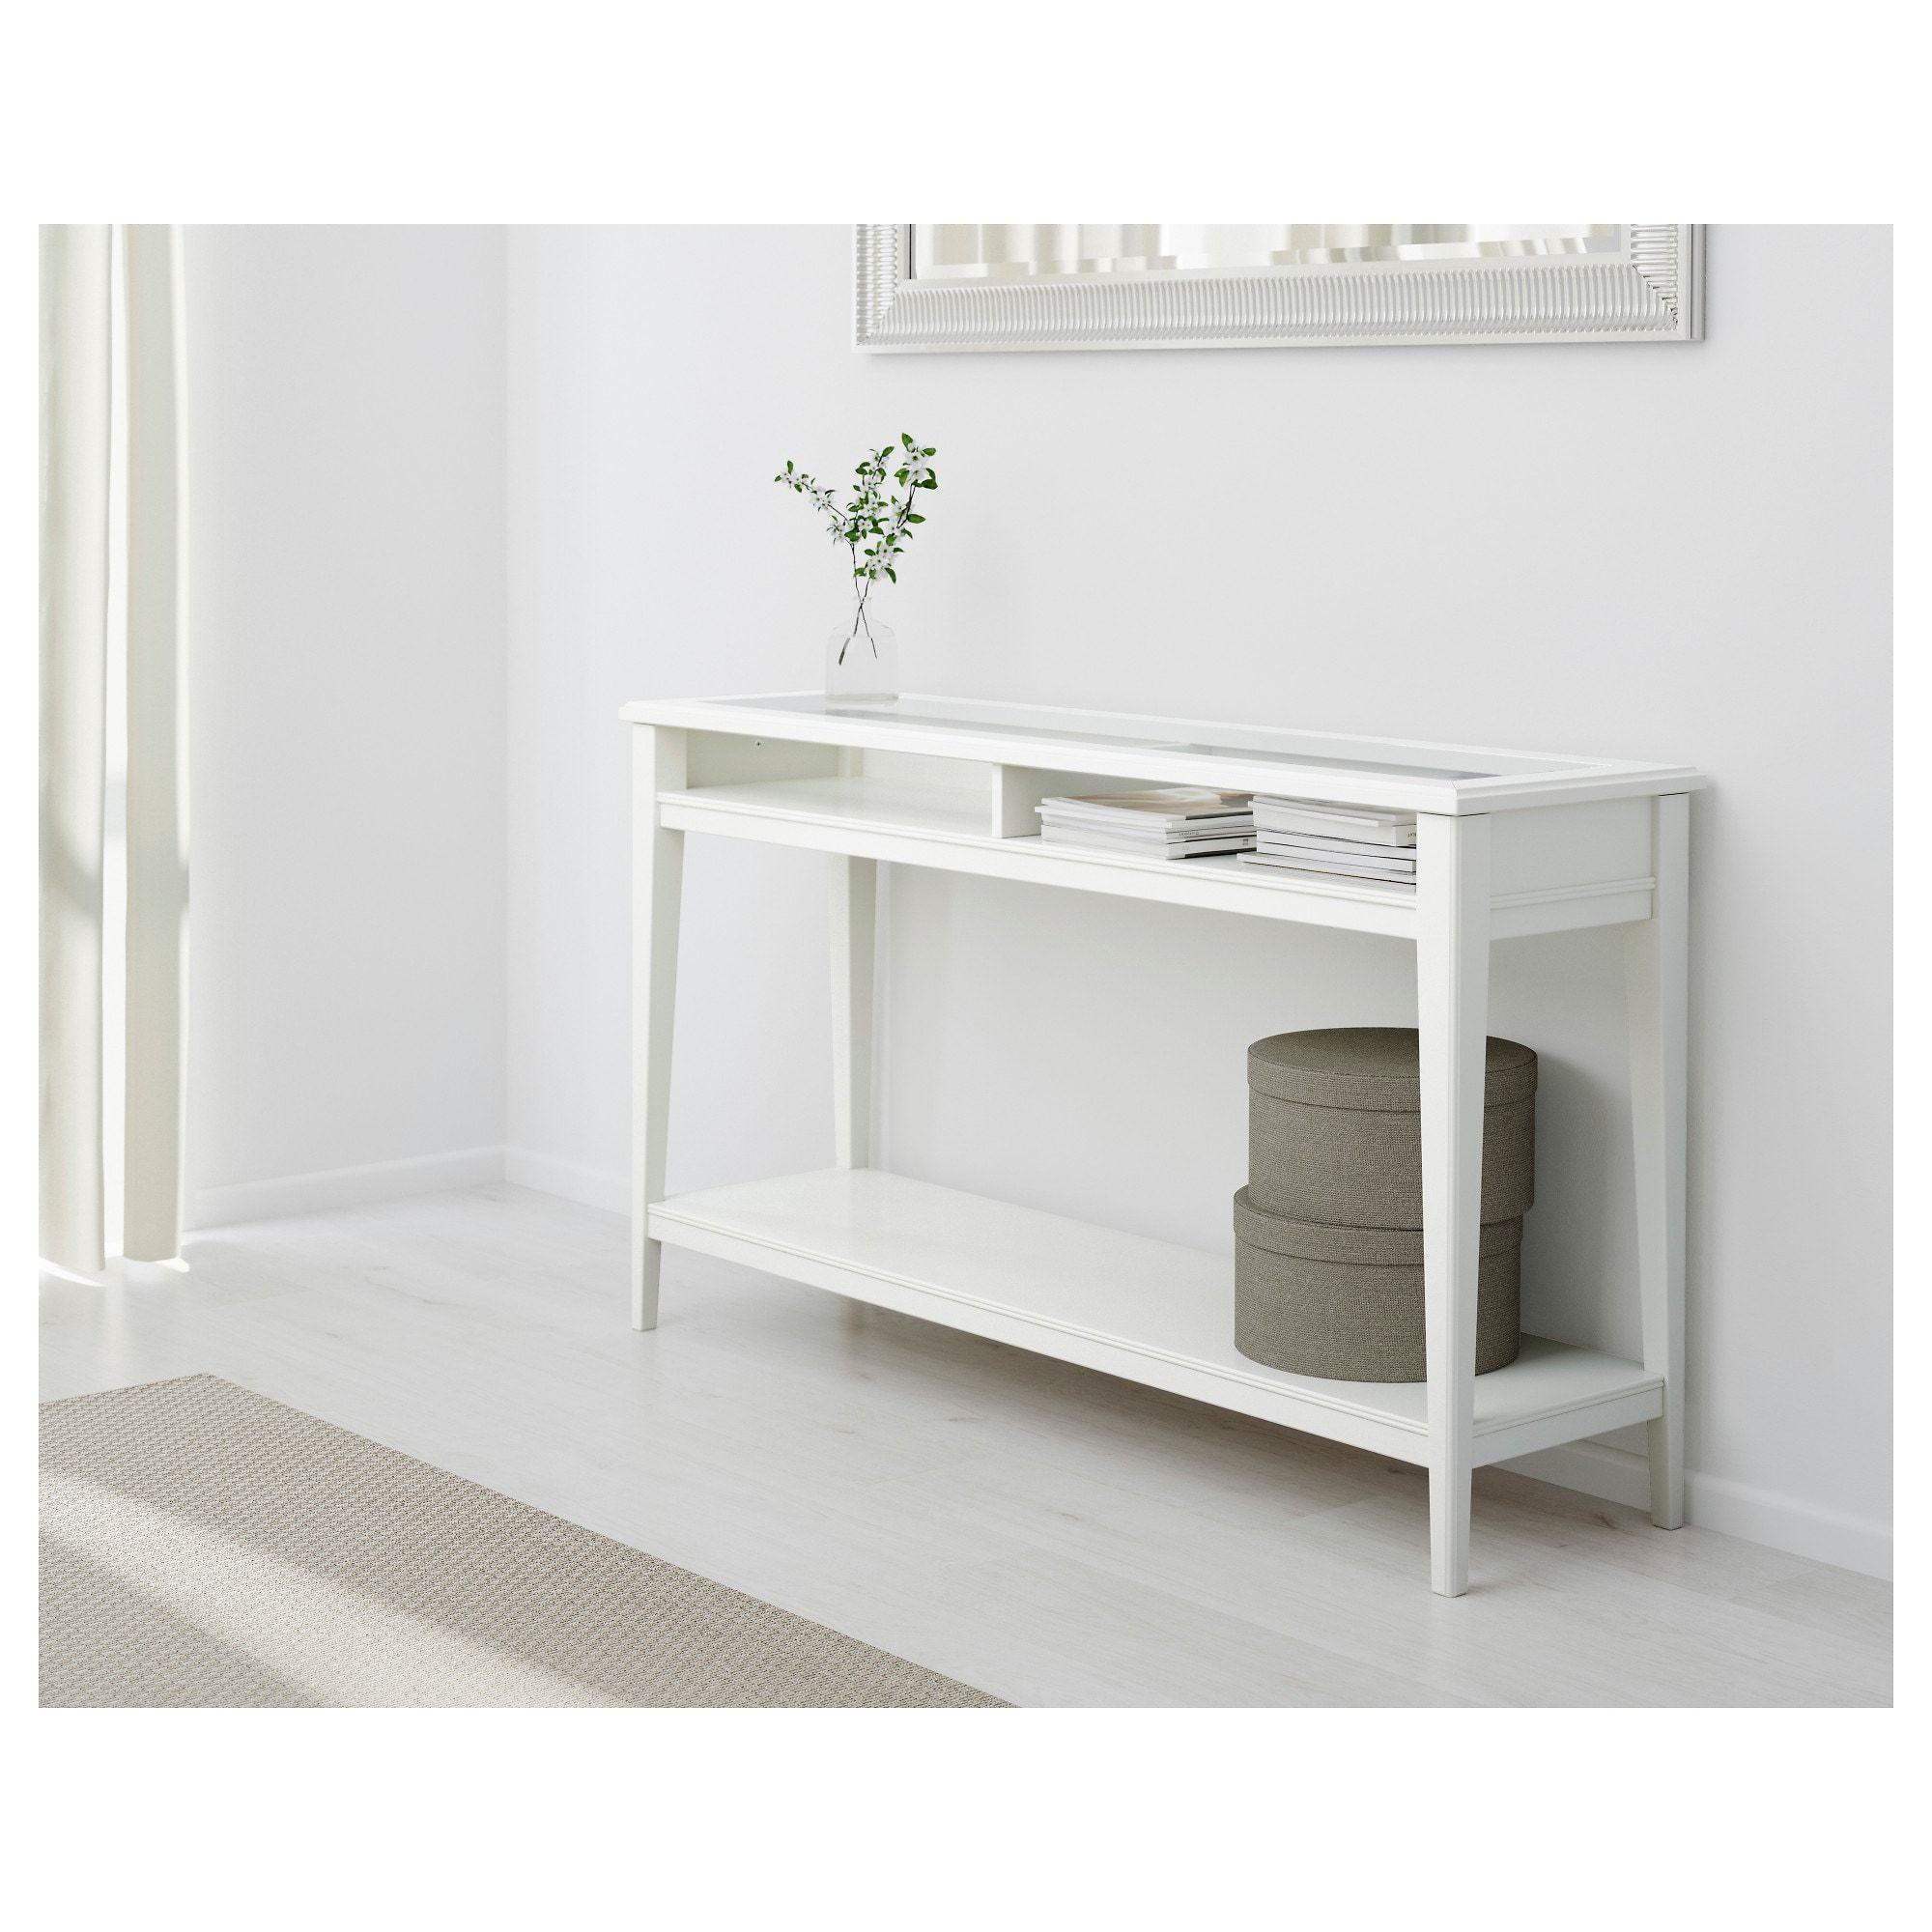 Liatorp Console Table White Glass 52 3 8x14 5 8 Ikea Ikea